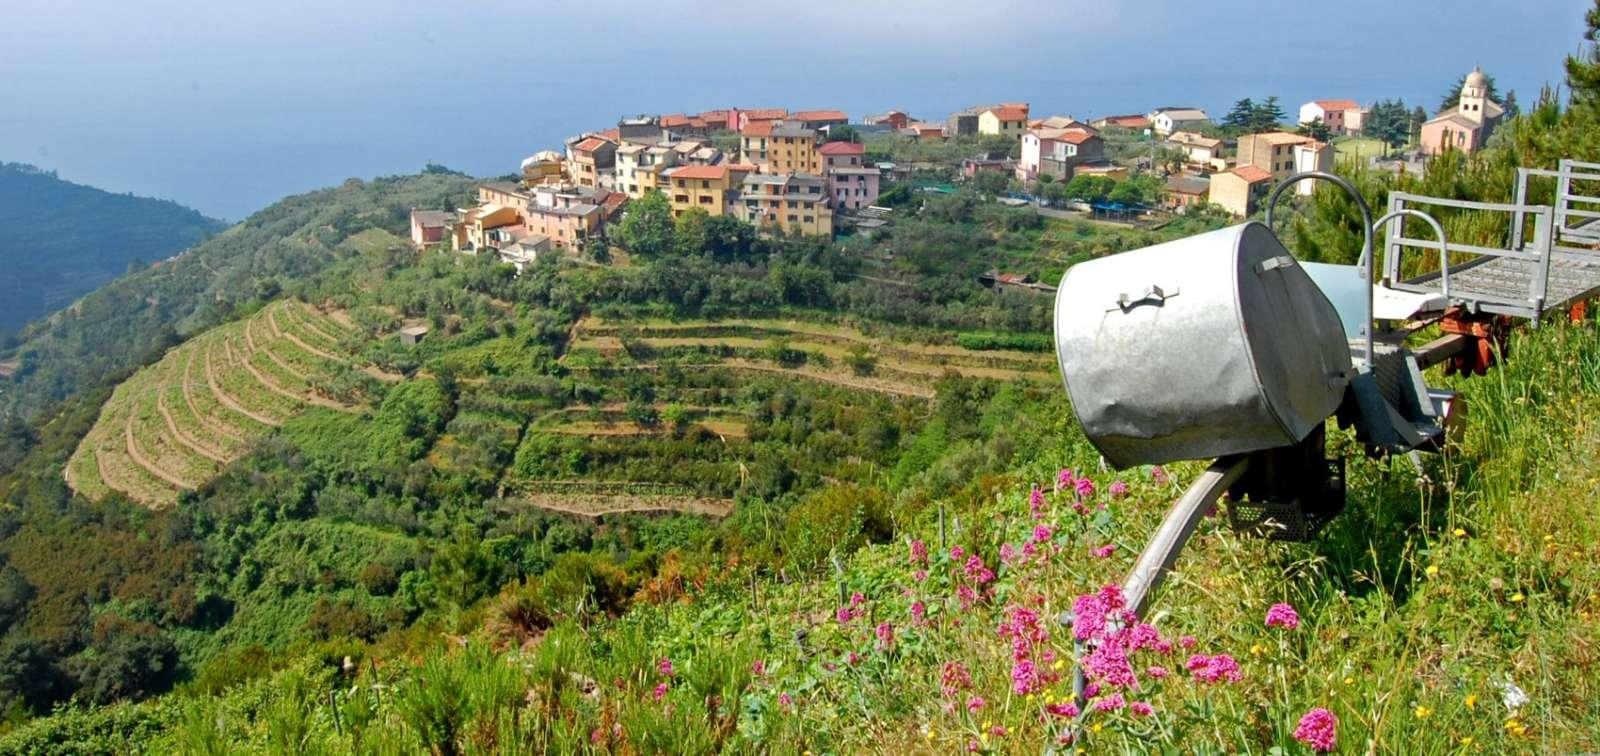 Landsbyen Volastra som hotellet ligger i